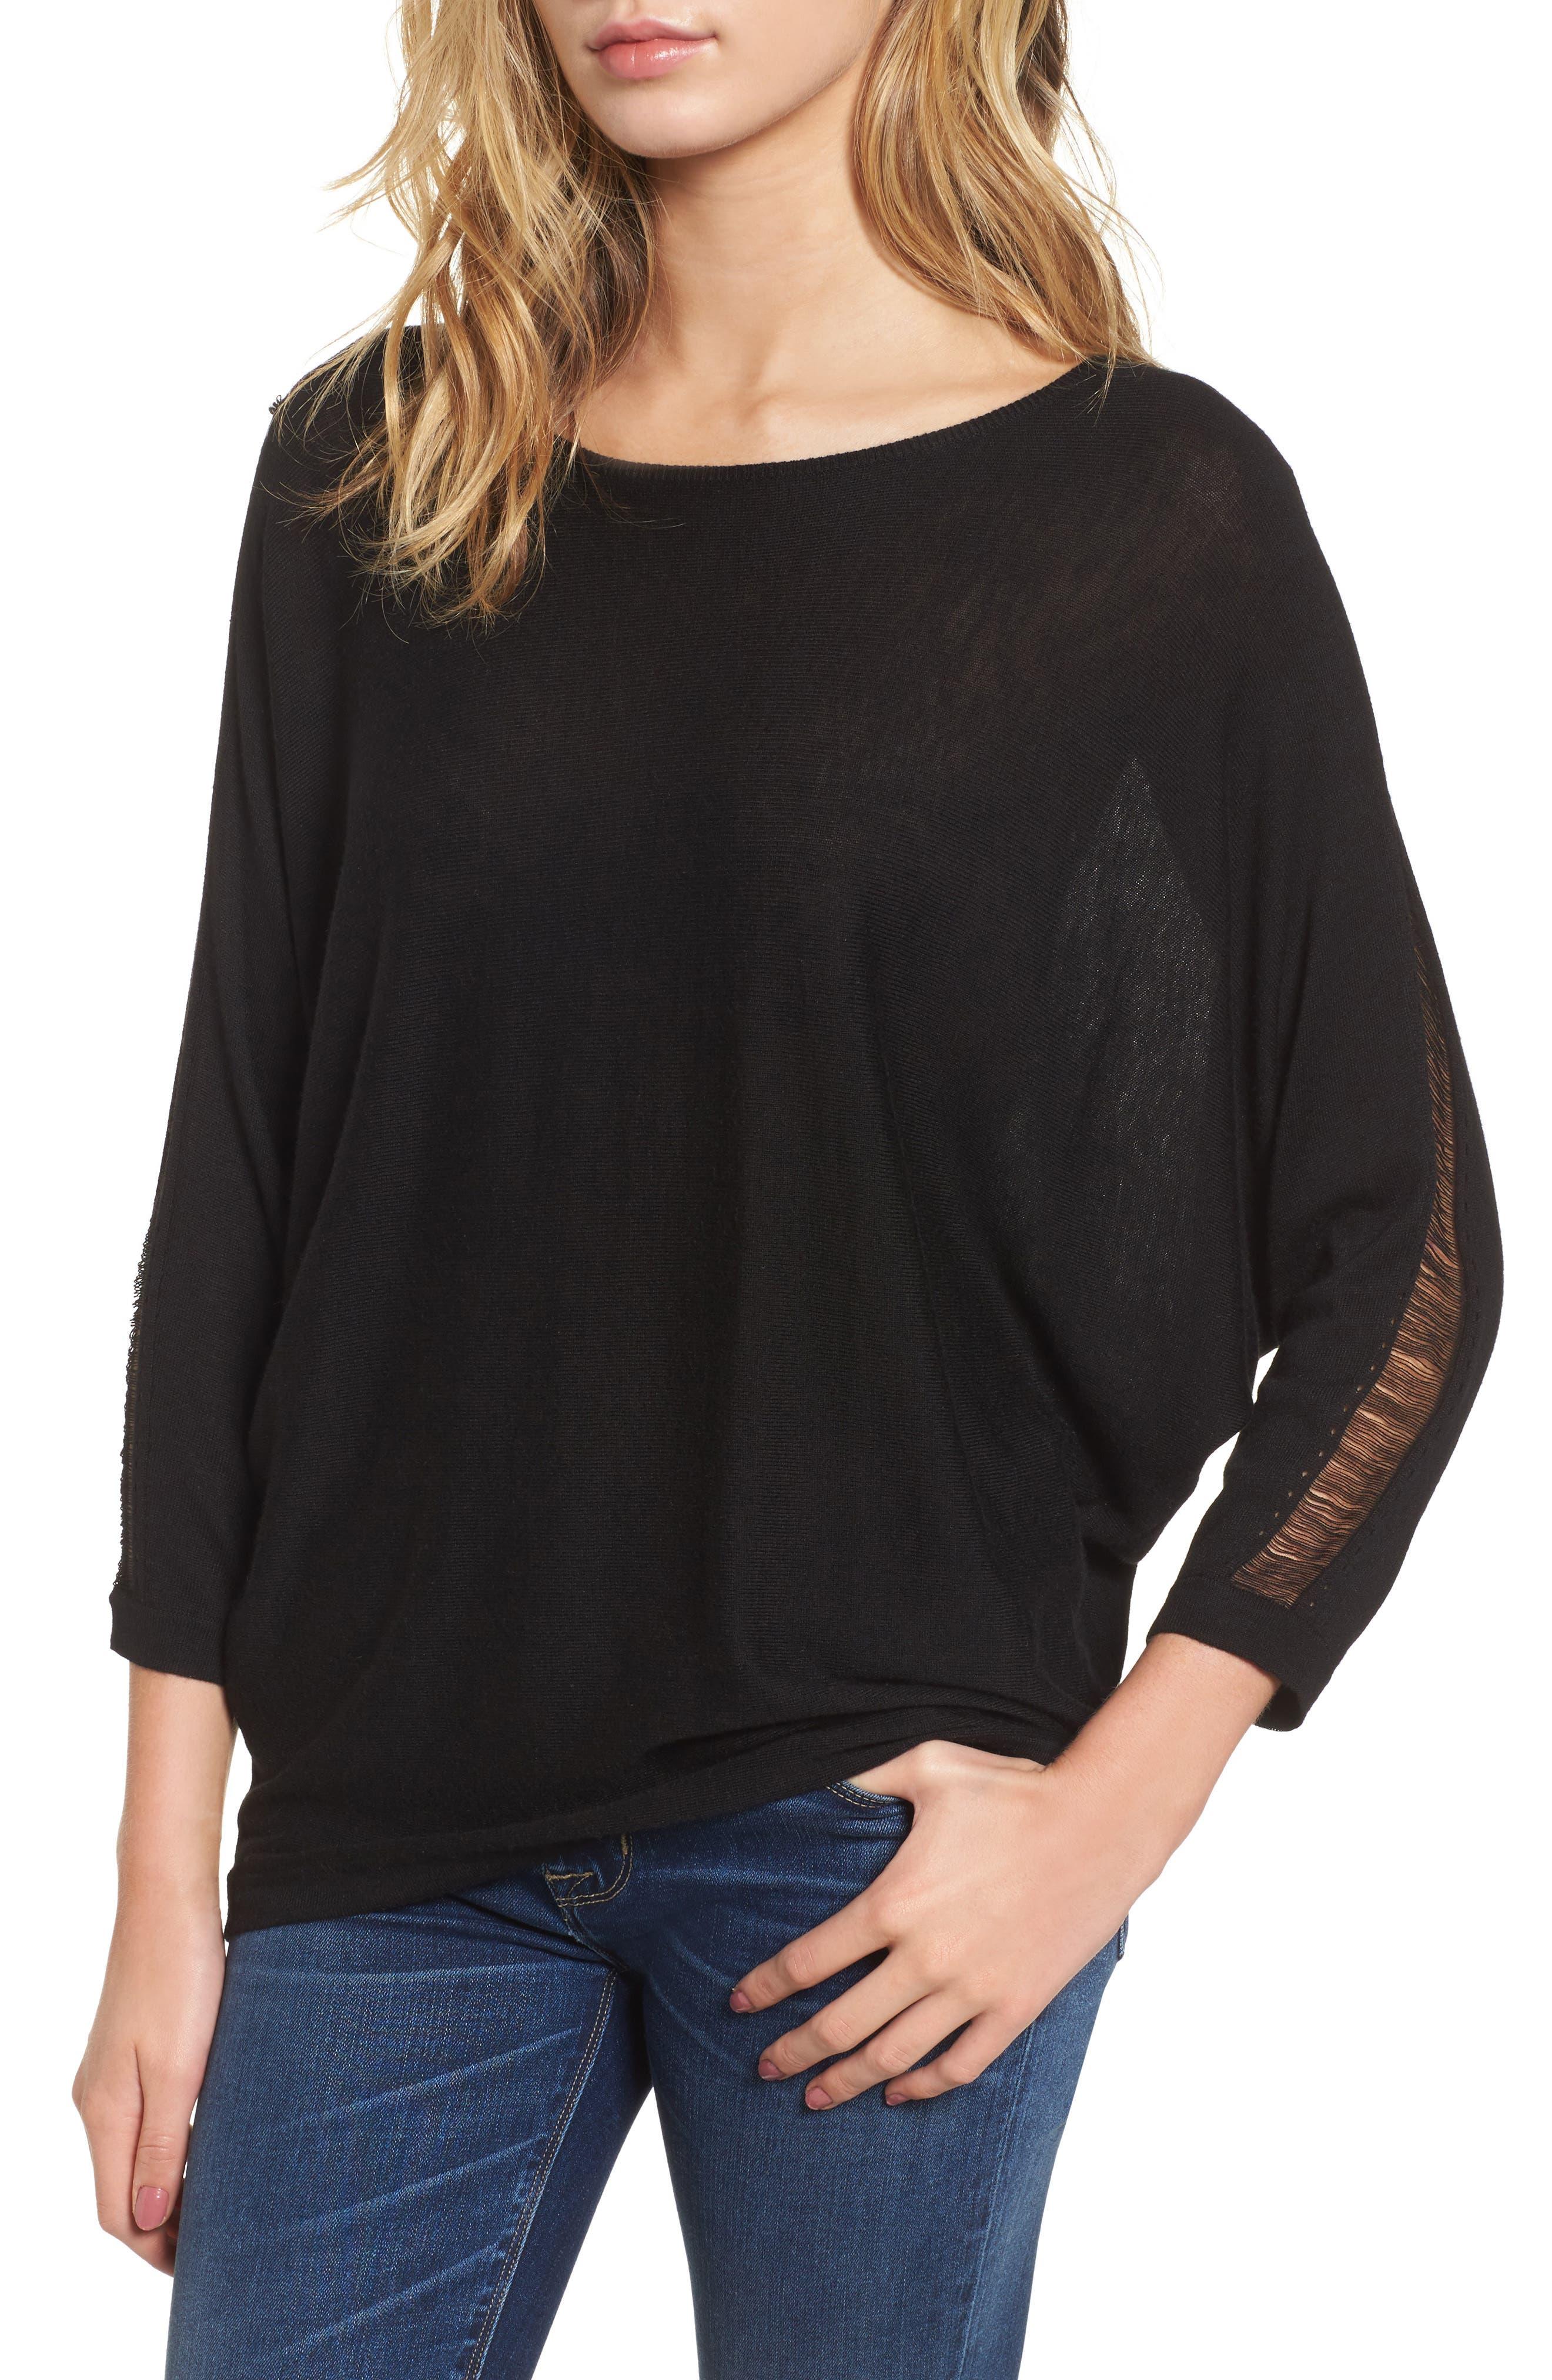 Whitlock Sweater,                             Main thumbnail 1, color,                             Black